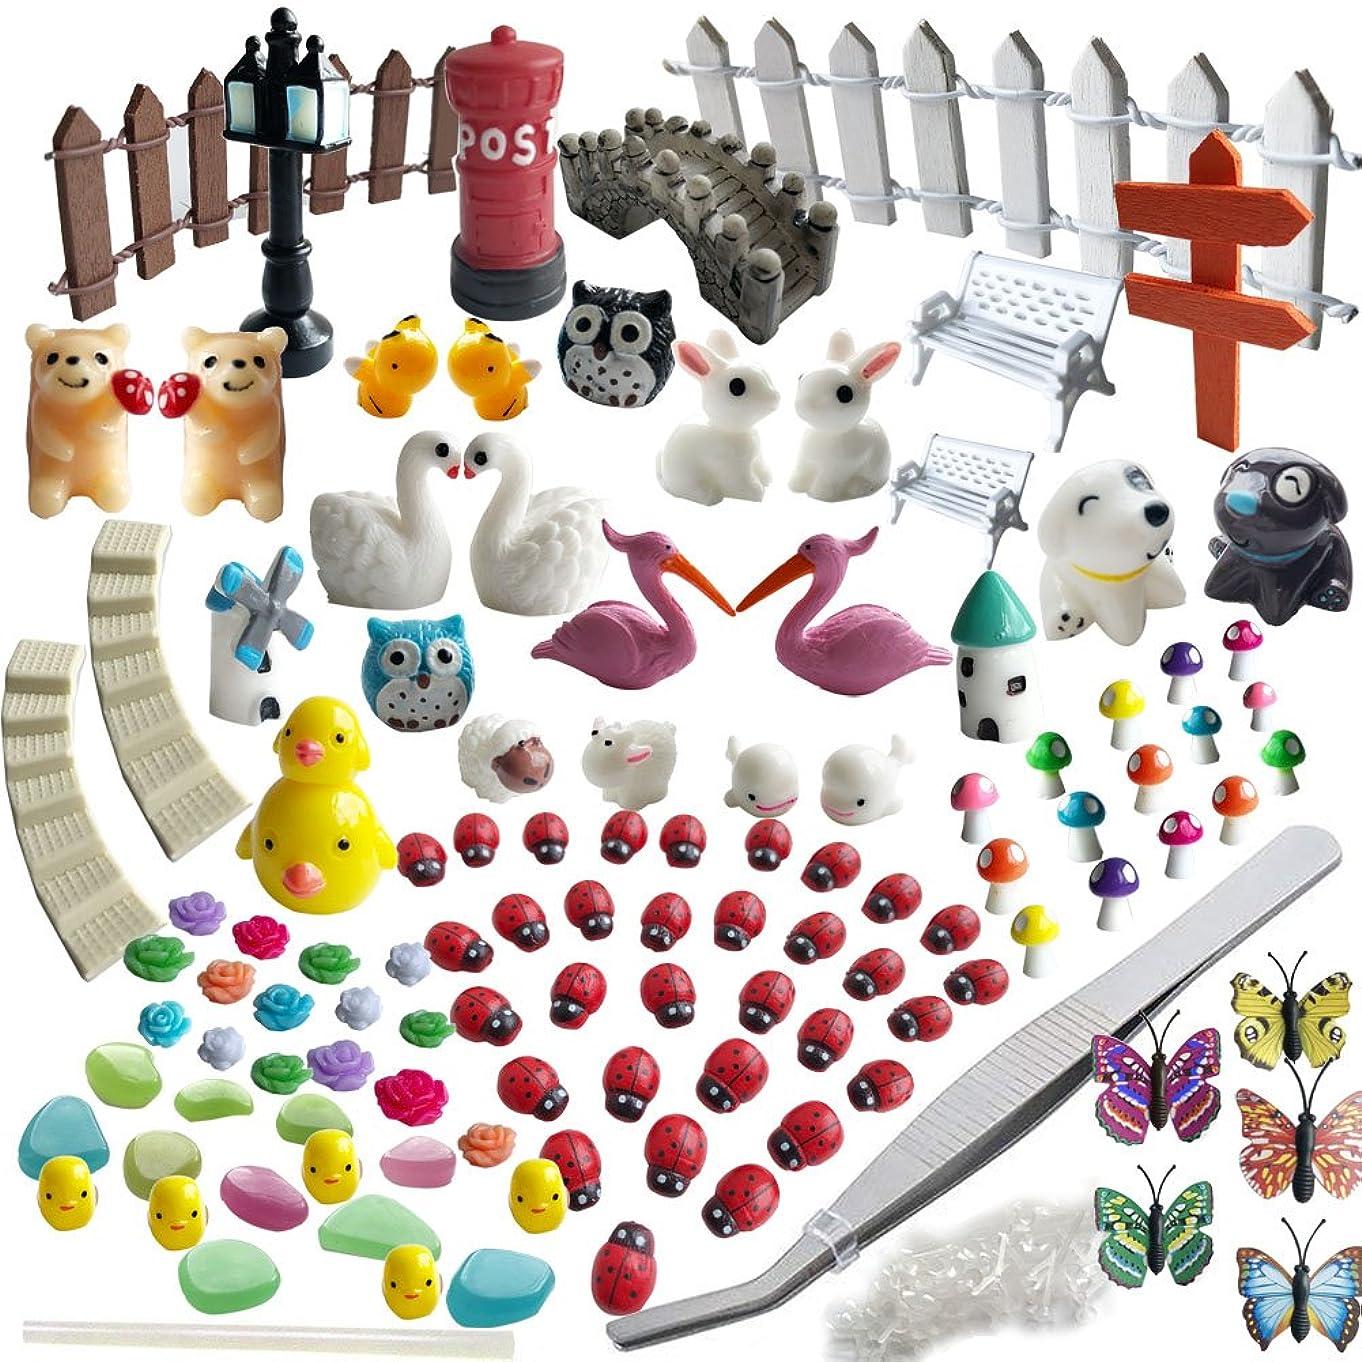 AZYC Miniature Garden Ornaments,109 Pcs Miniature Ornaments Kit Set with 1 Pcs Tweezer for DIY Fairy Garden Dollhouse Decoration